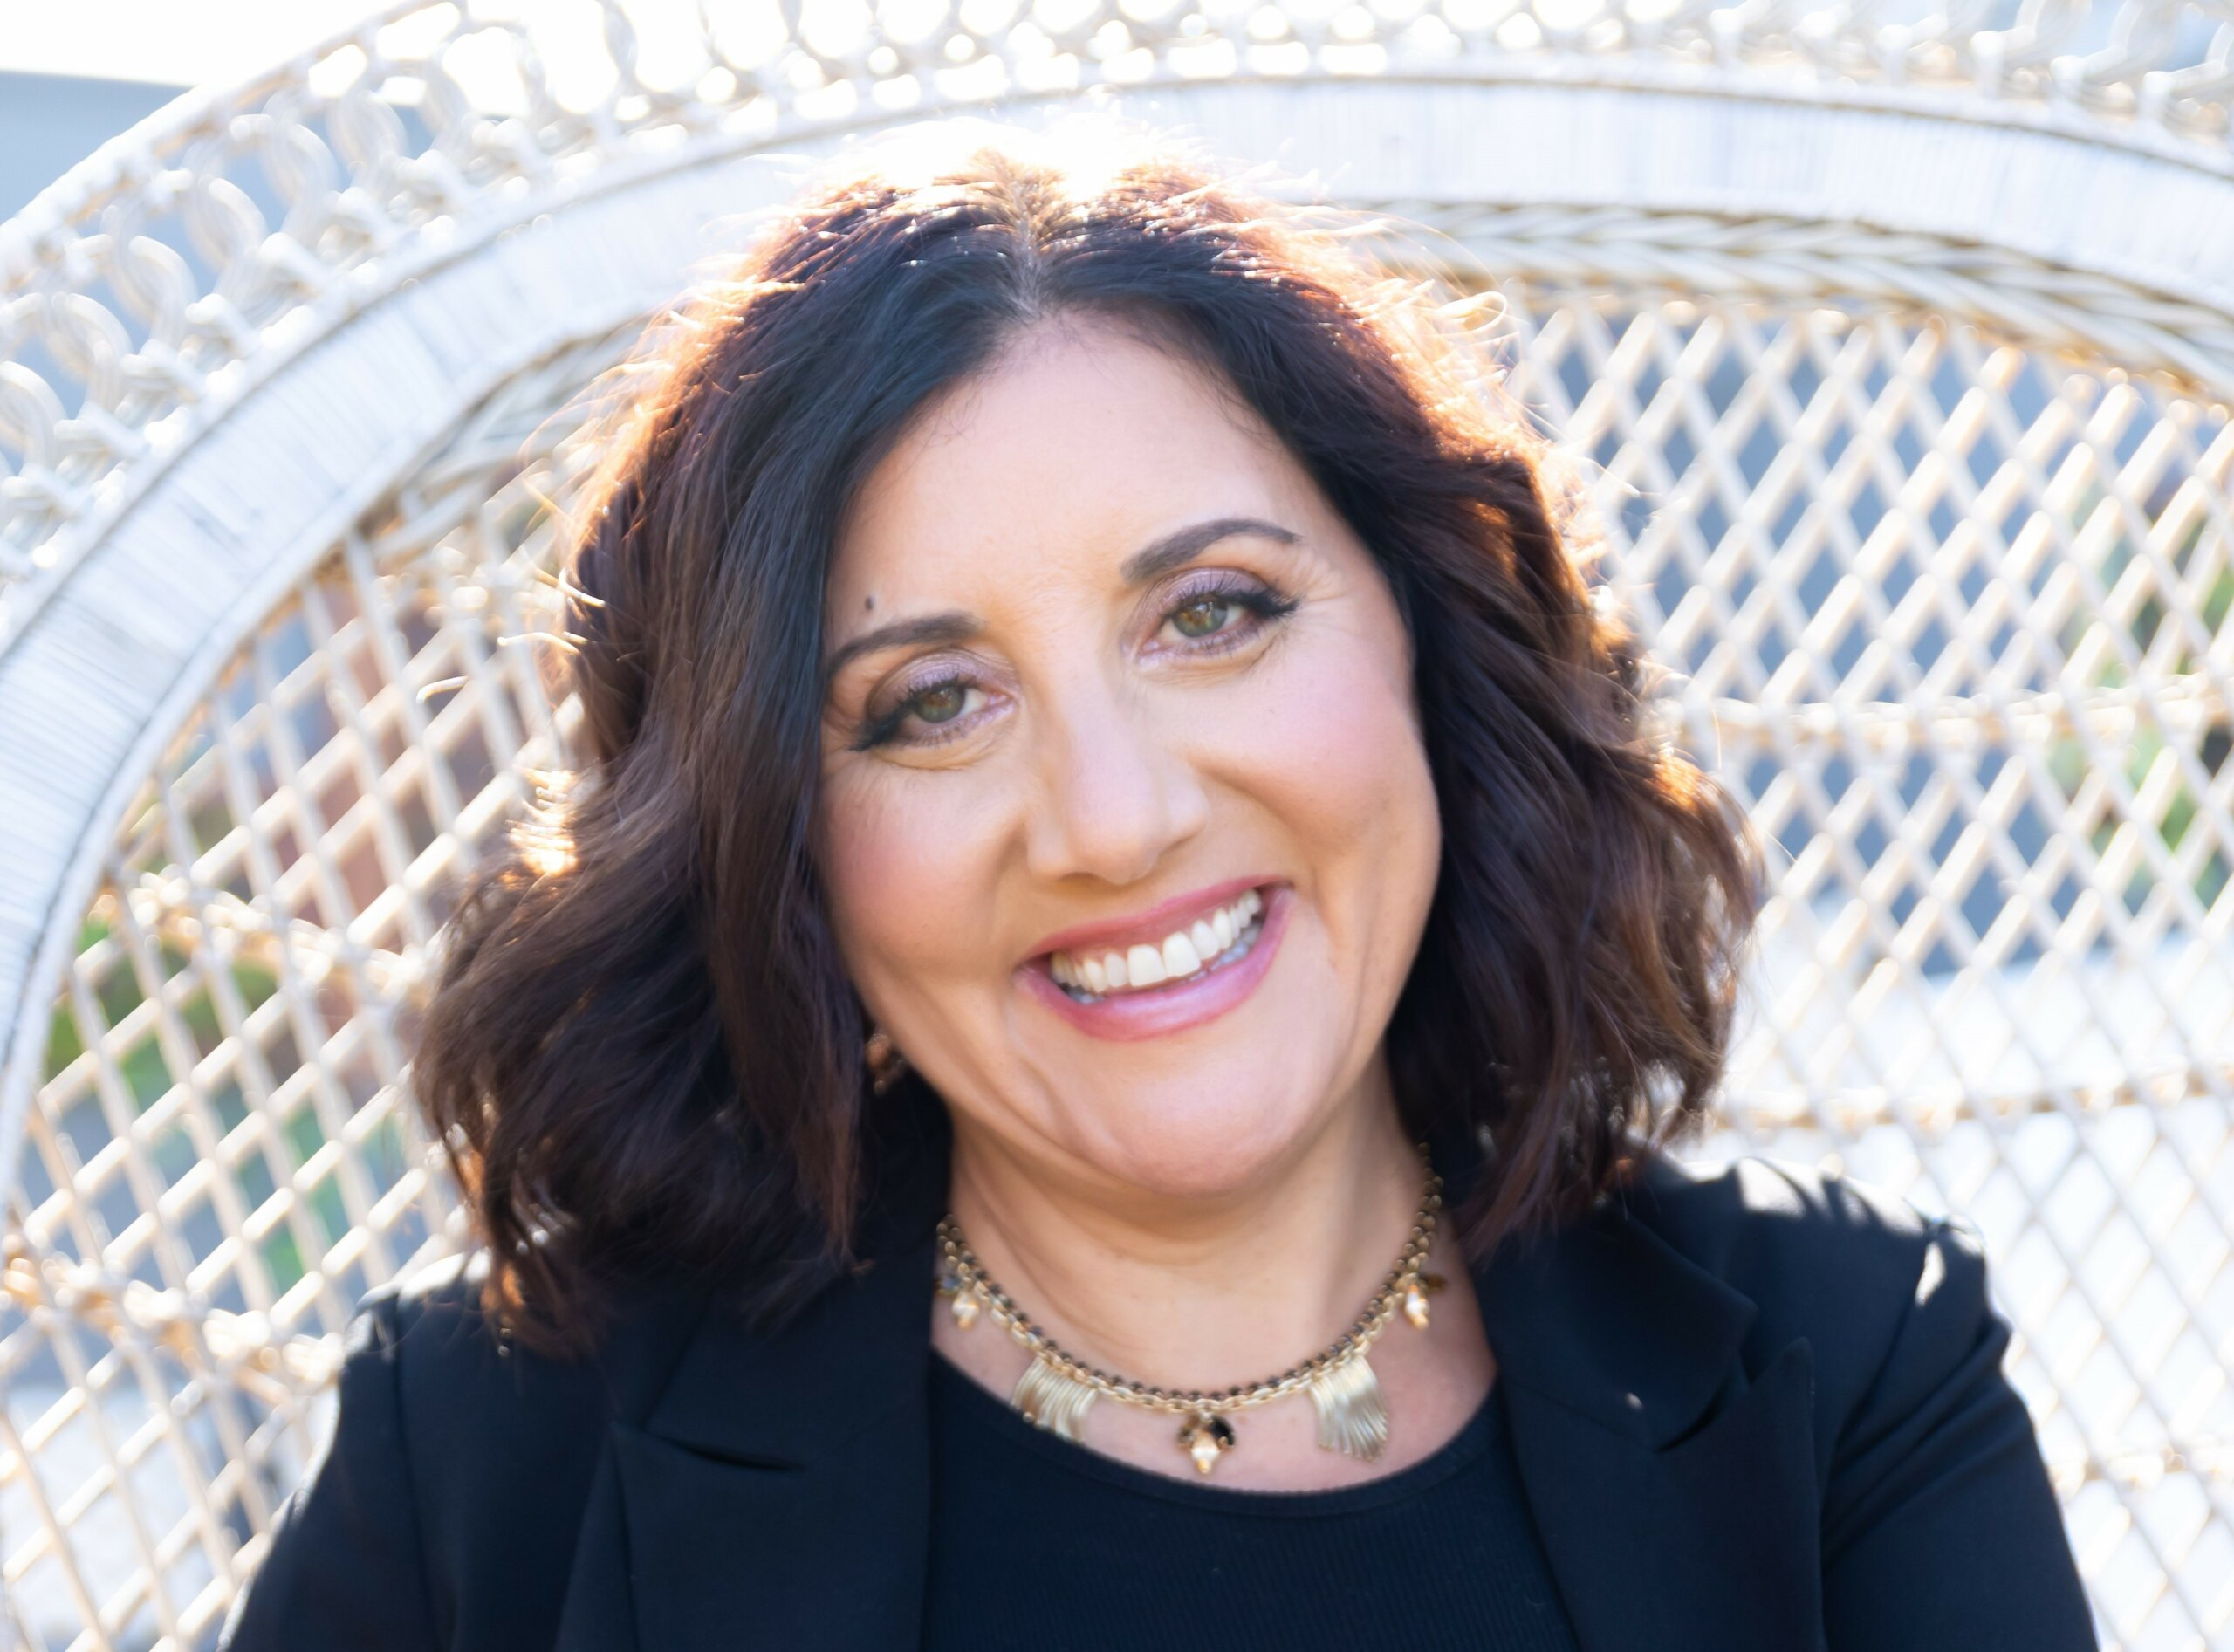 Business coach for entrepreneurs Diane Prince